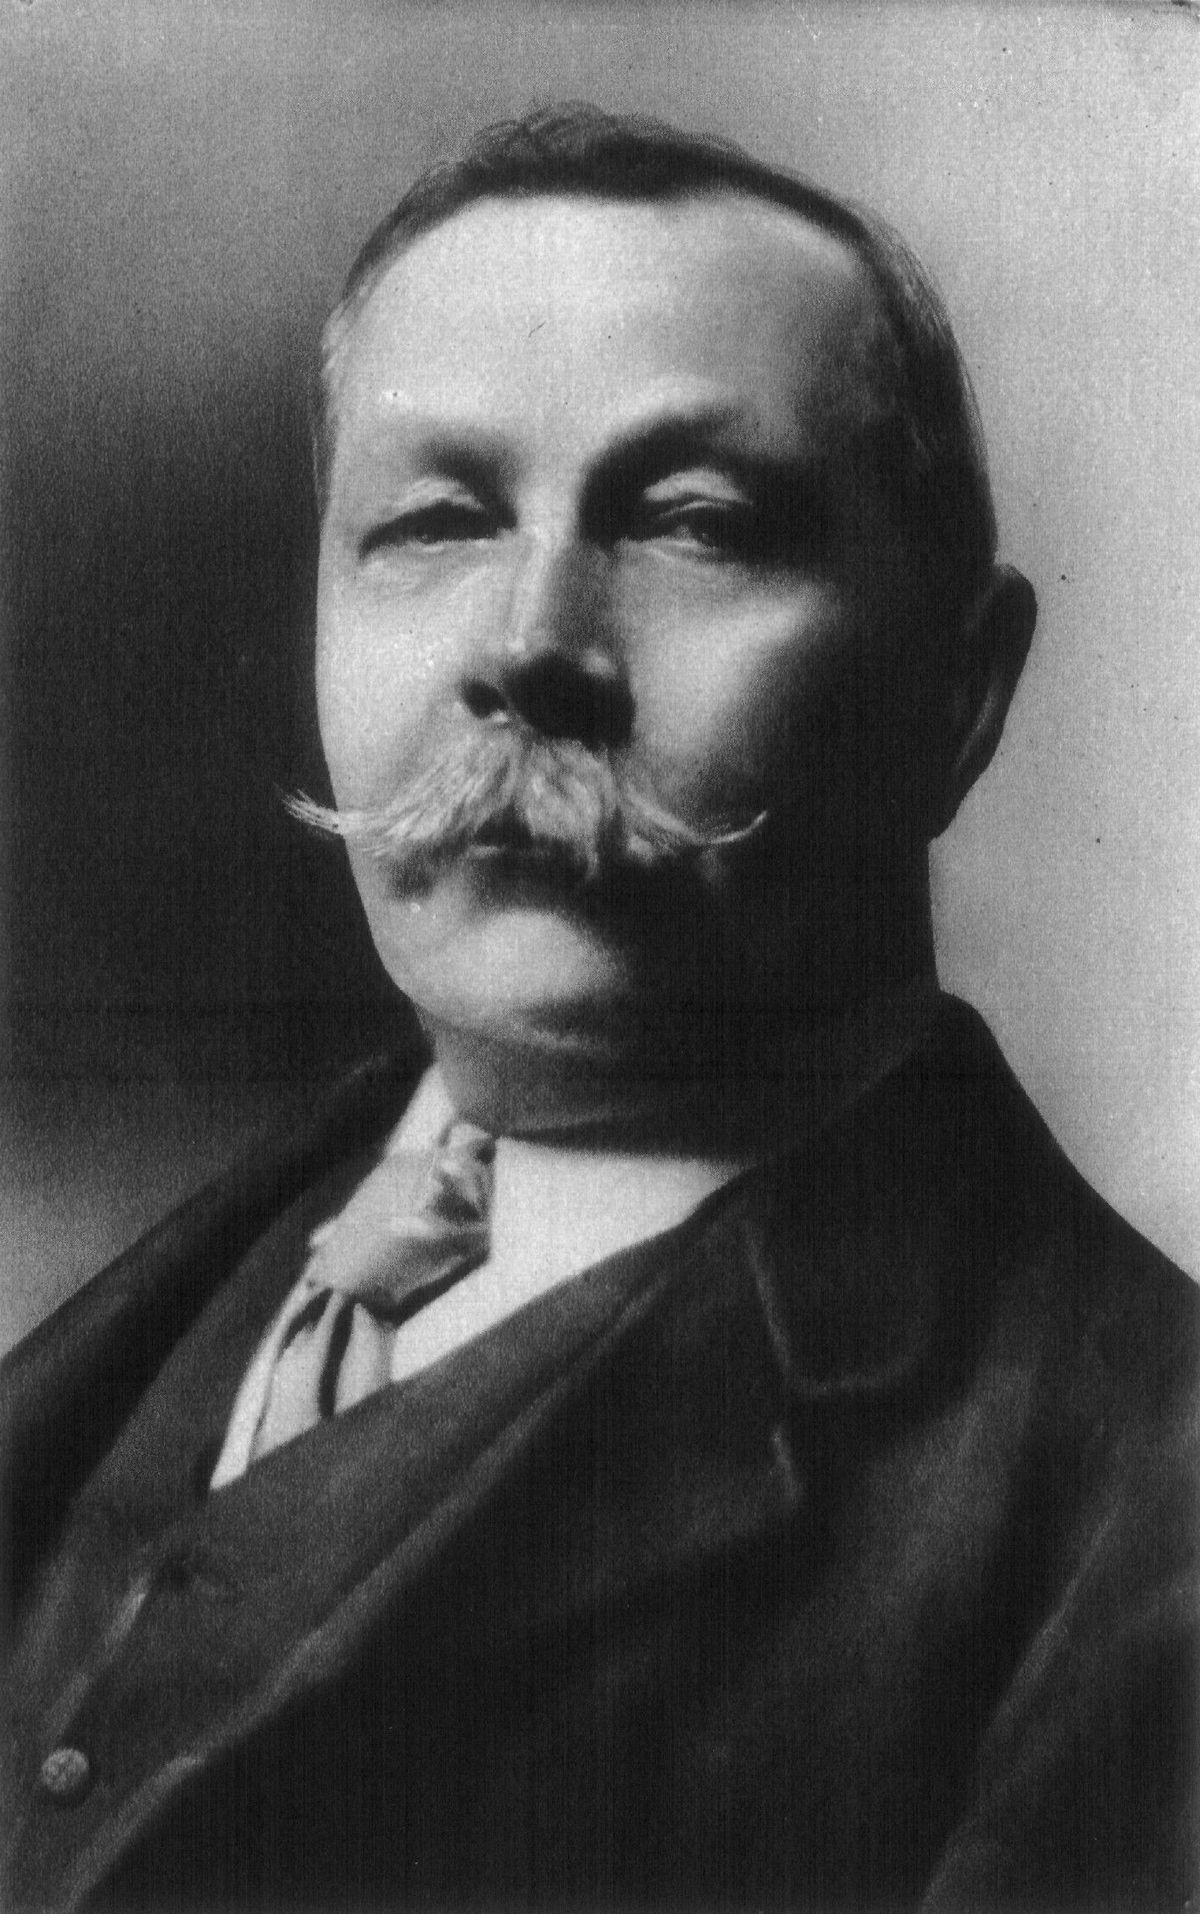 Arthur Conan Doyle Sherlock Holmes : arthur, conan, doyle, sherlock, holmes, Arthur, Conan, Doyle, Wikipedia